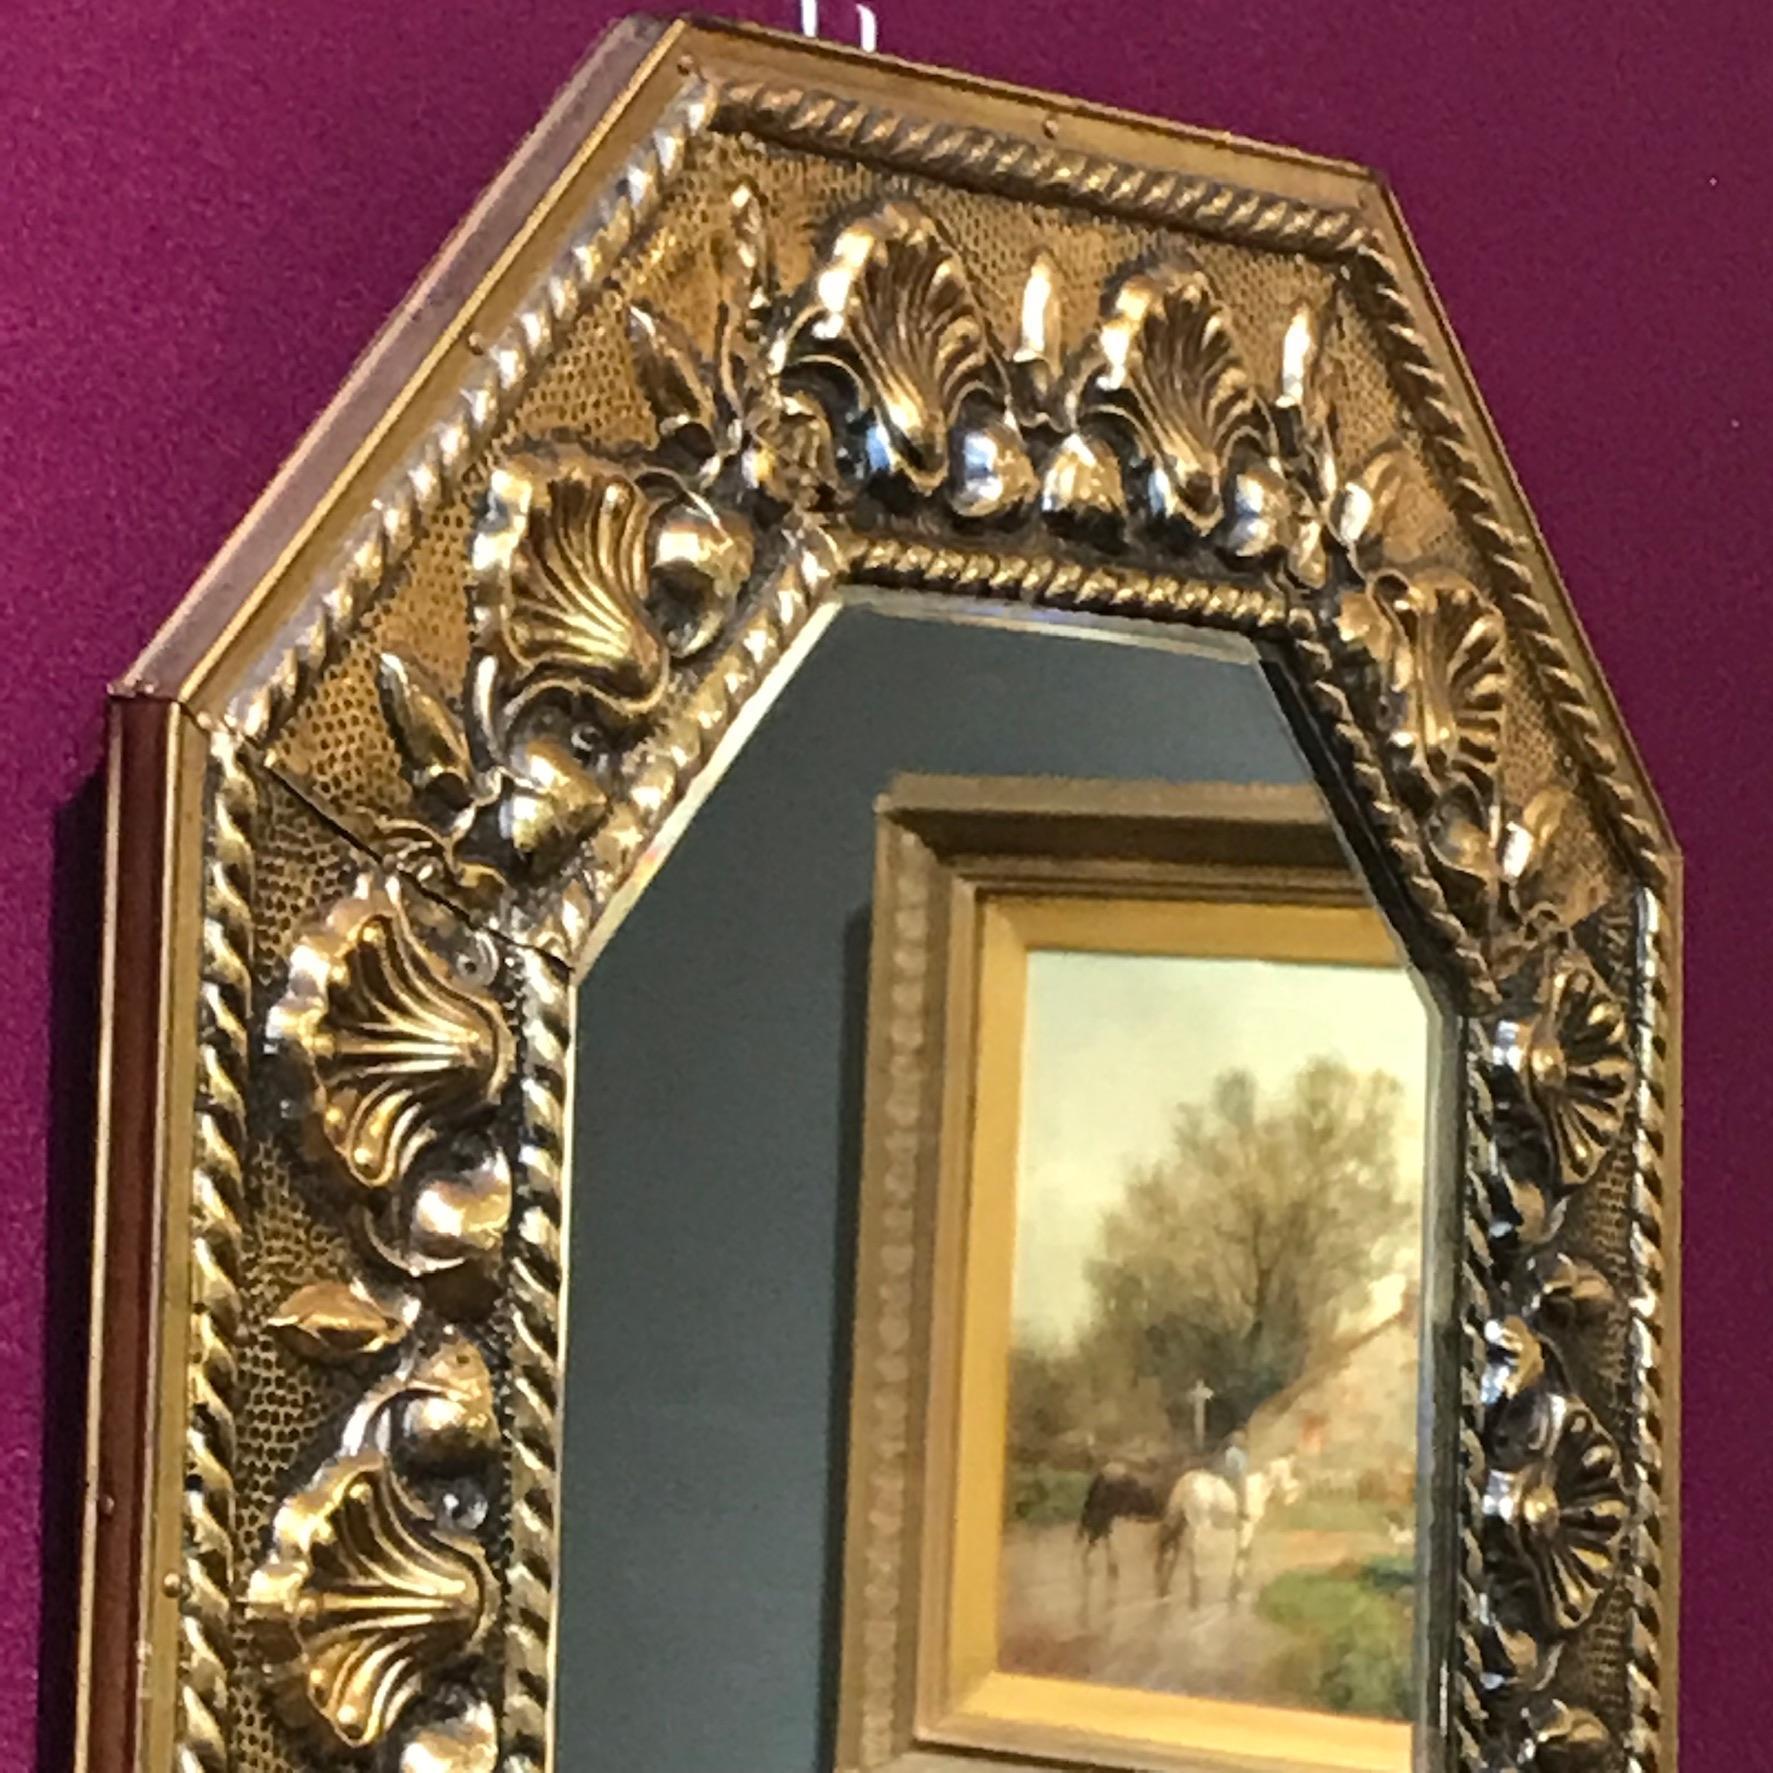 Decorative Brass Framed Bevelled Edge Wall Mirror ...